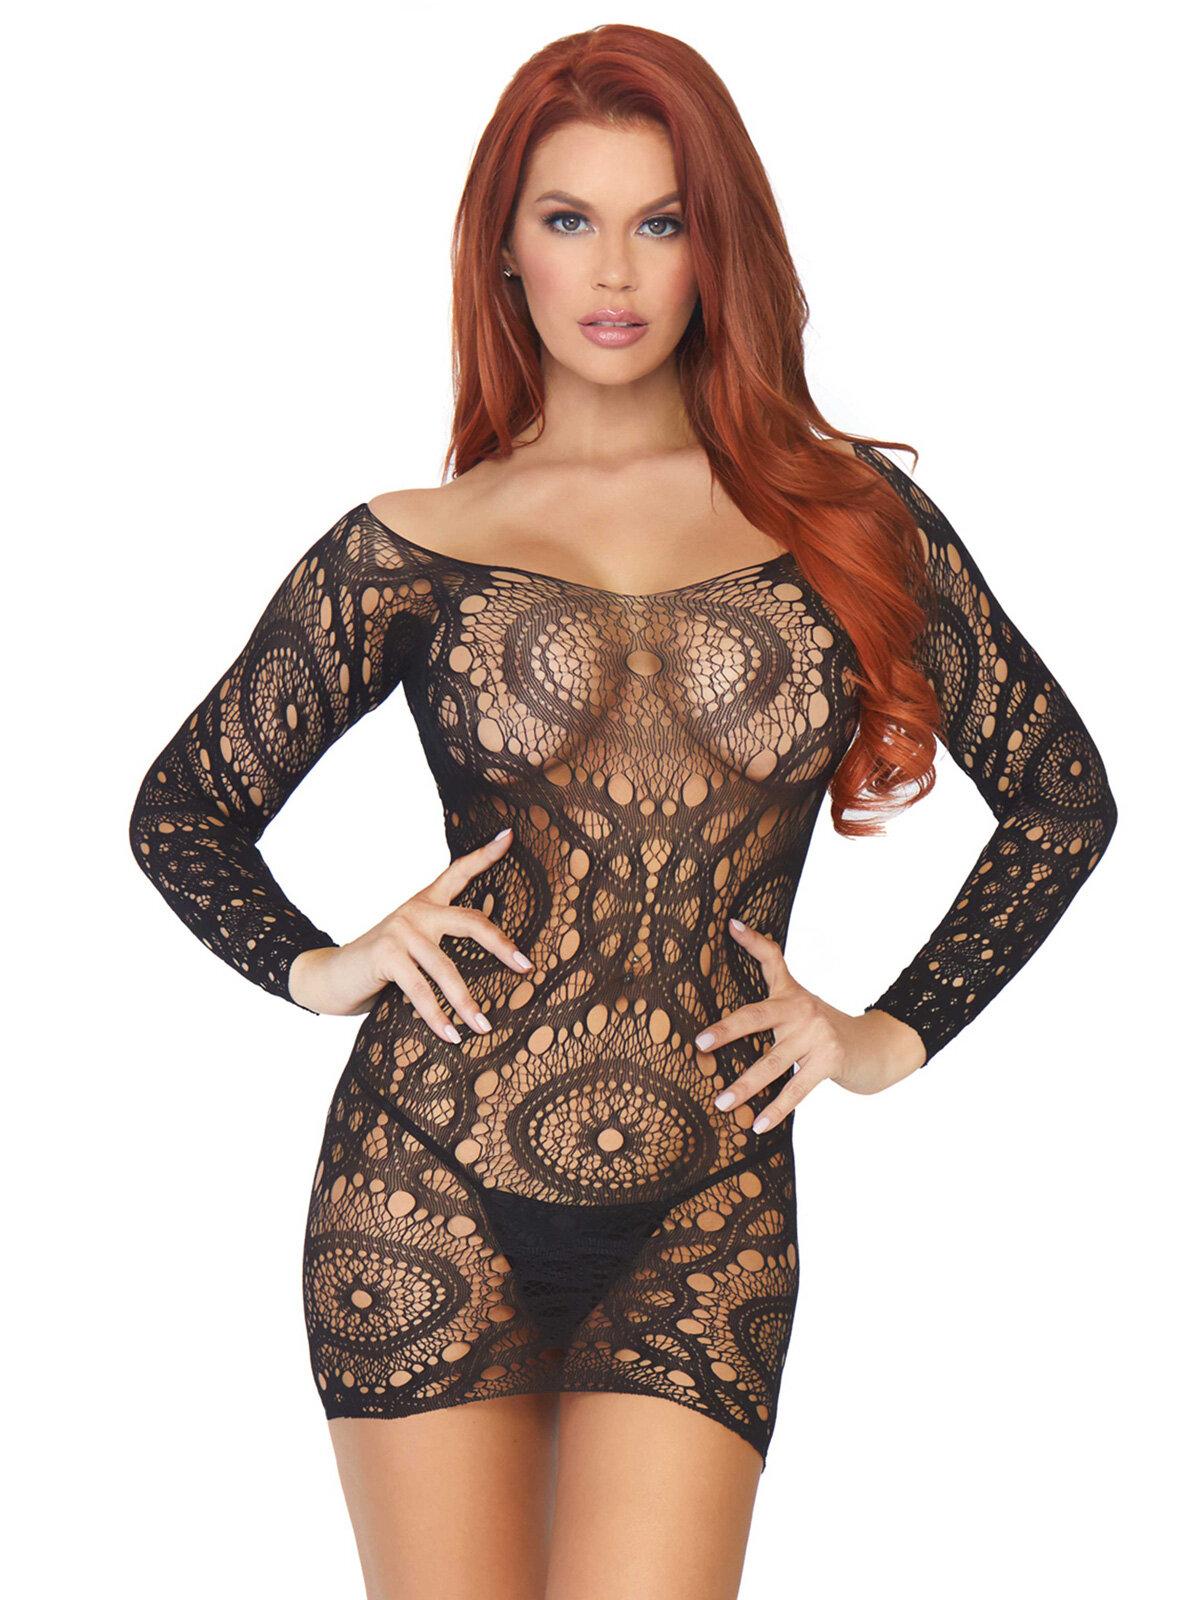 Chemise 86794 Negru 86794 Lace long sleeved mini dress